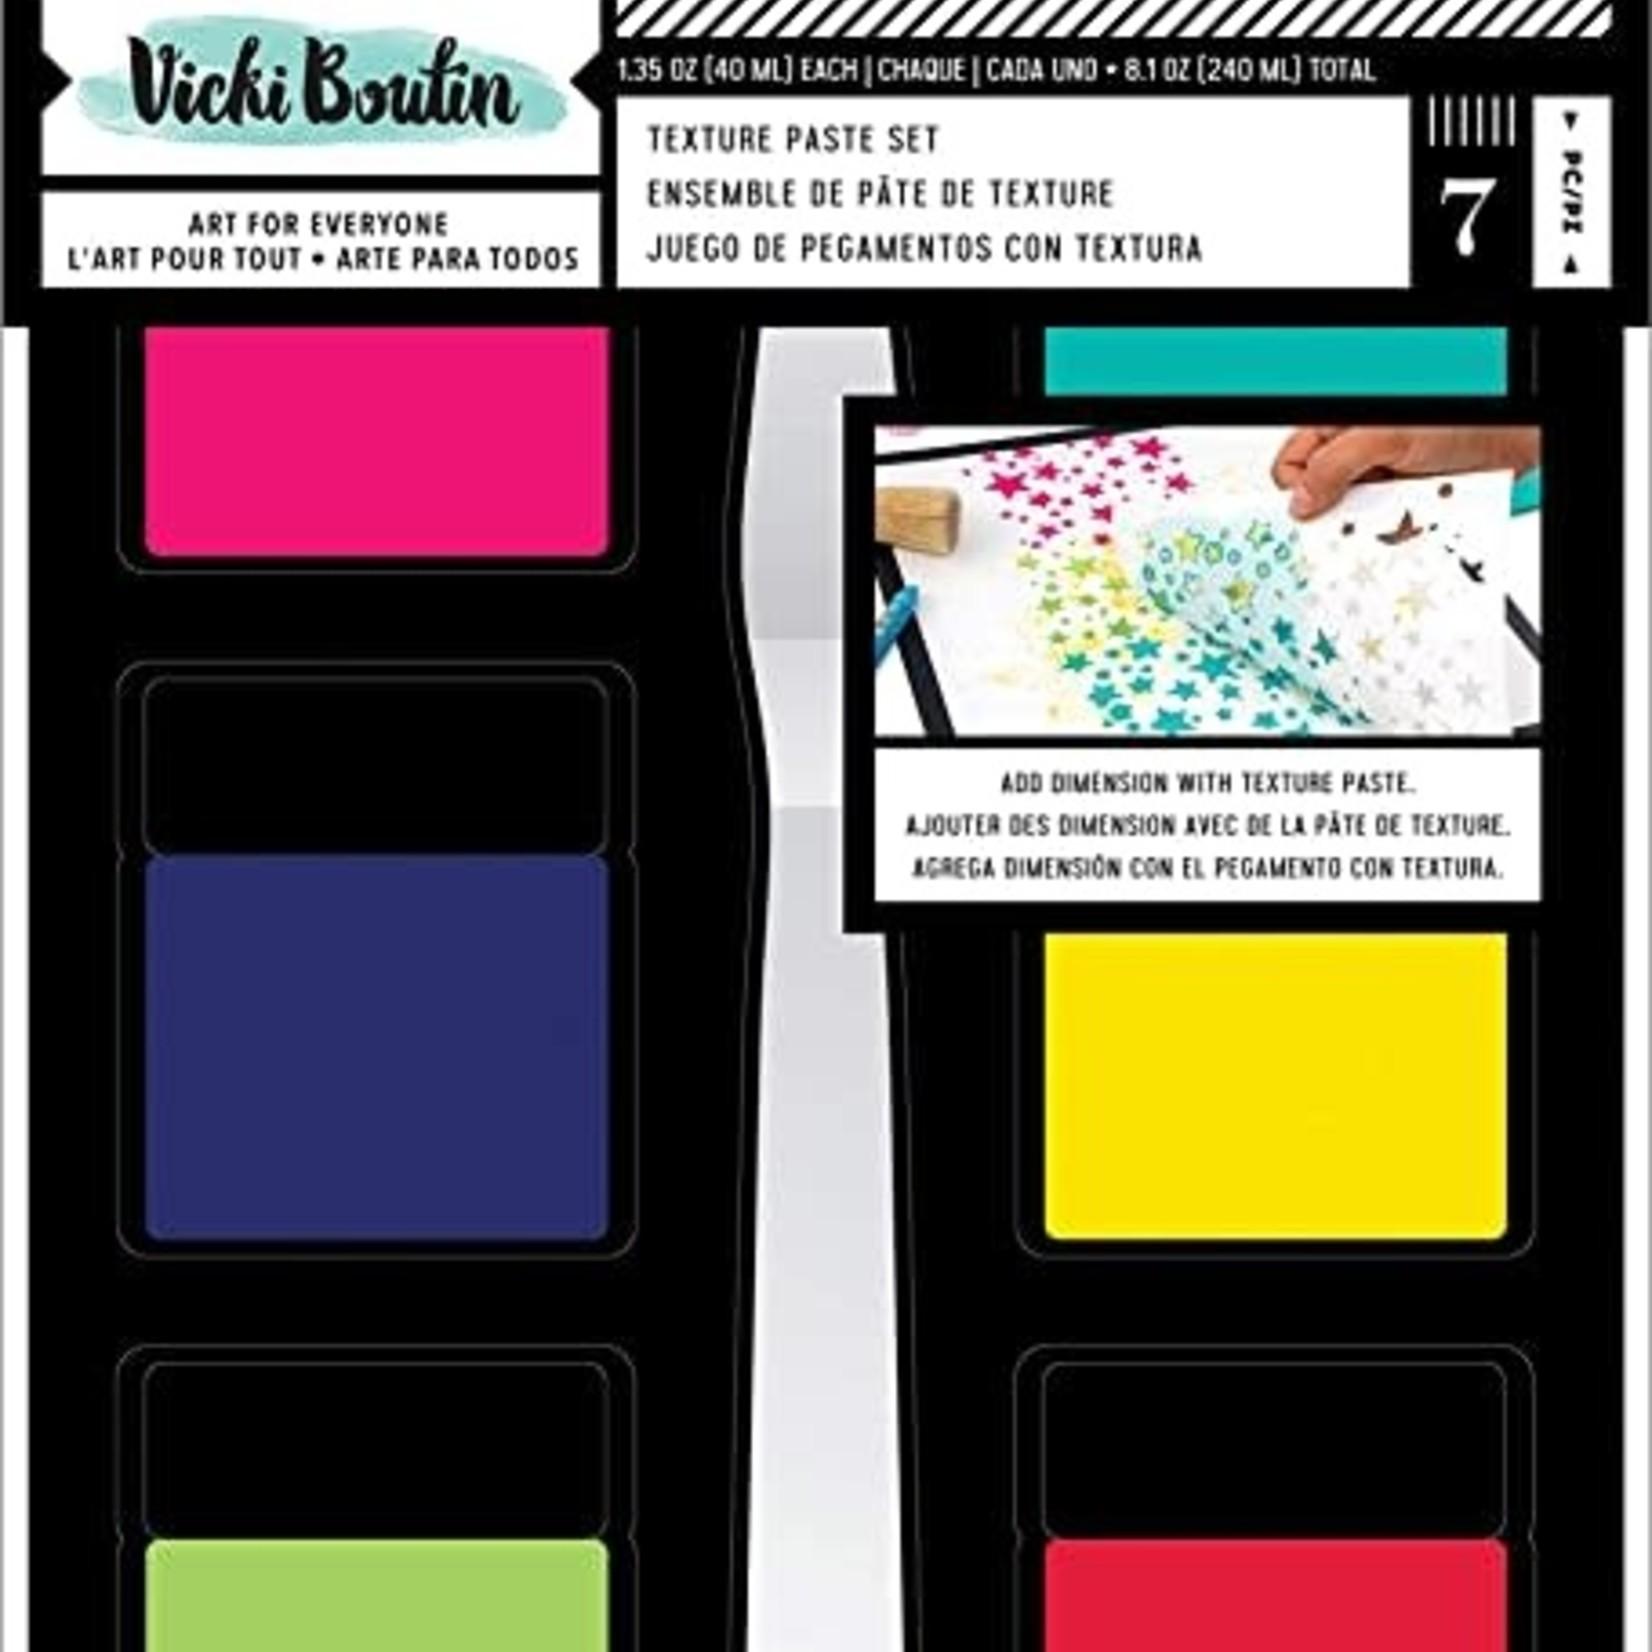 Vicki Boutin Mixed Media Texture Paste Set-(6) Colors & (1) Palette Knife